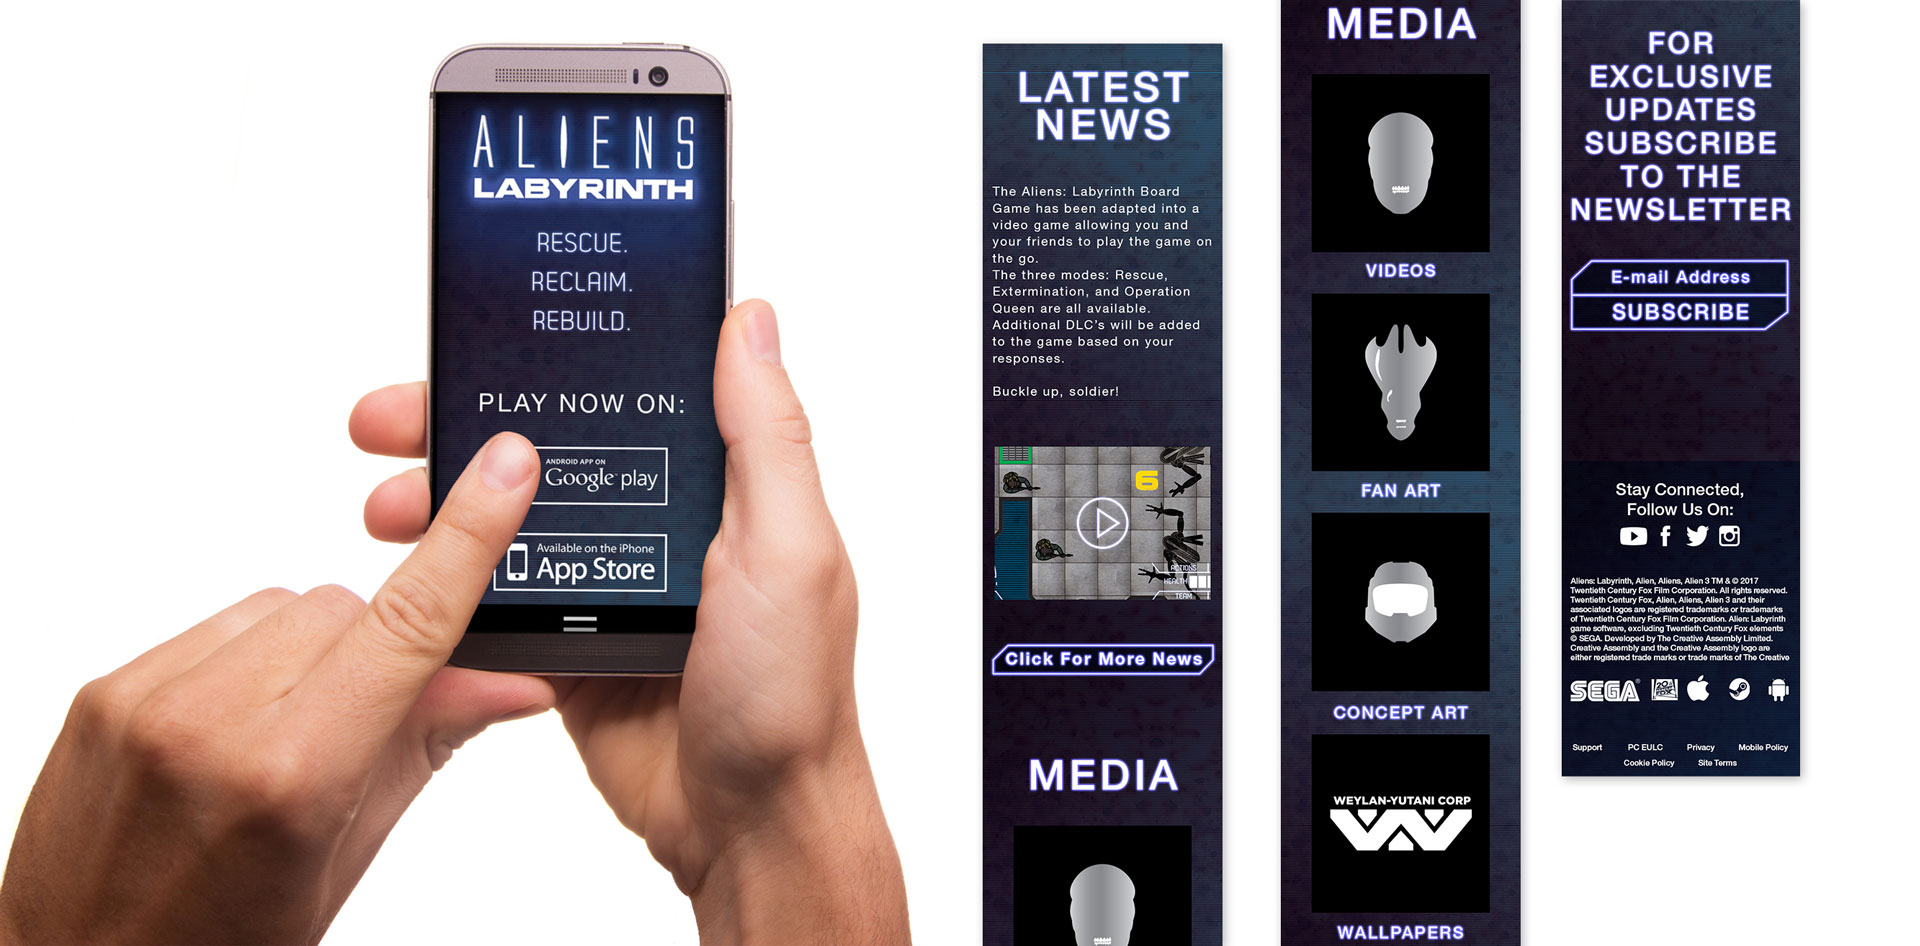 aliens-labyrinth-mobile-game-04.jpg